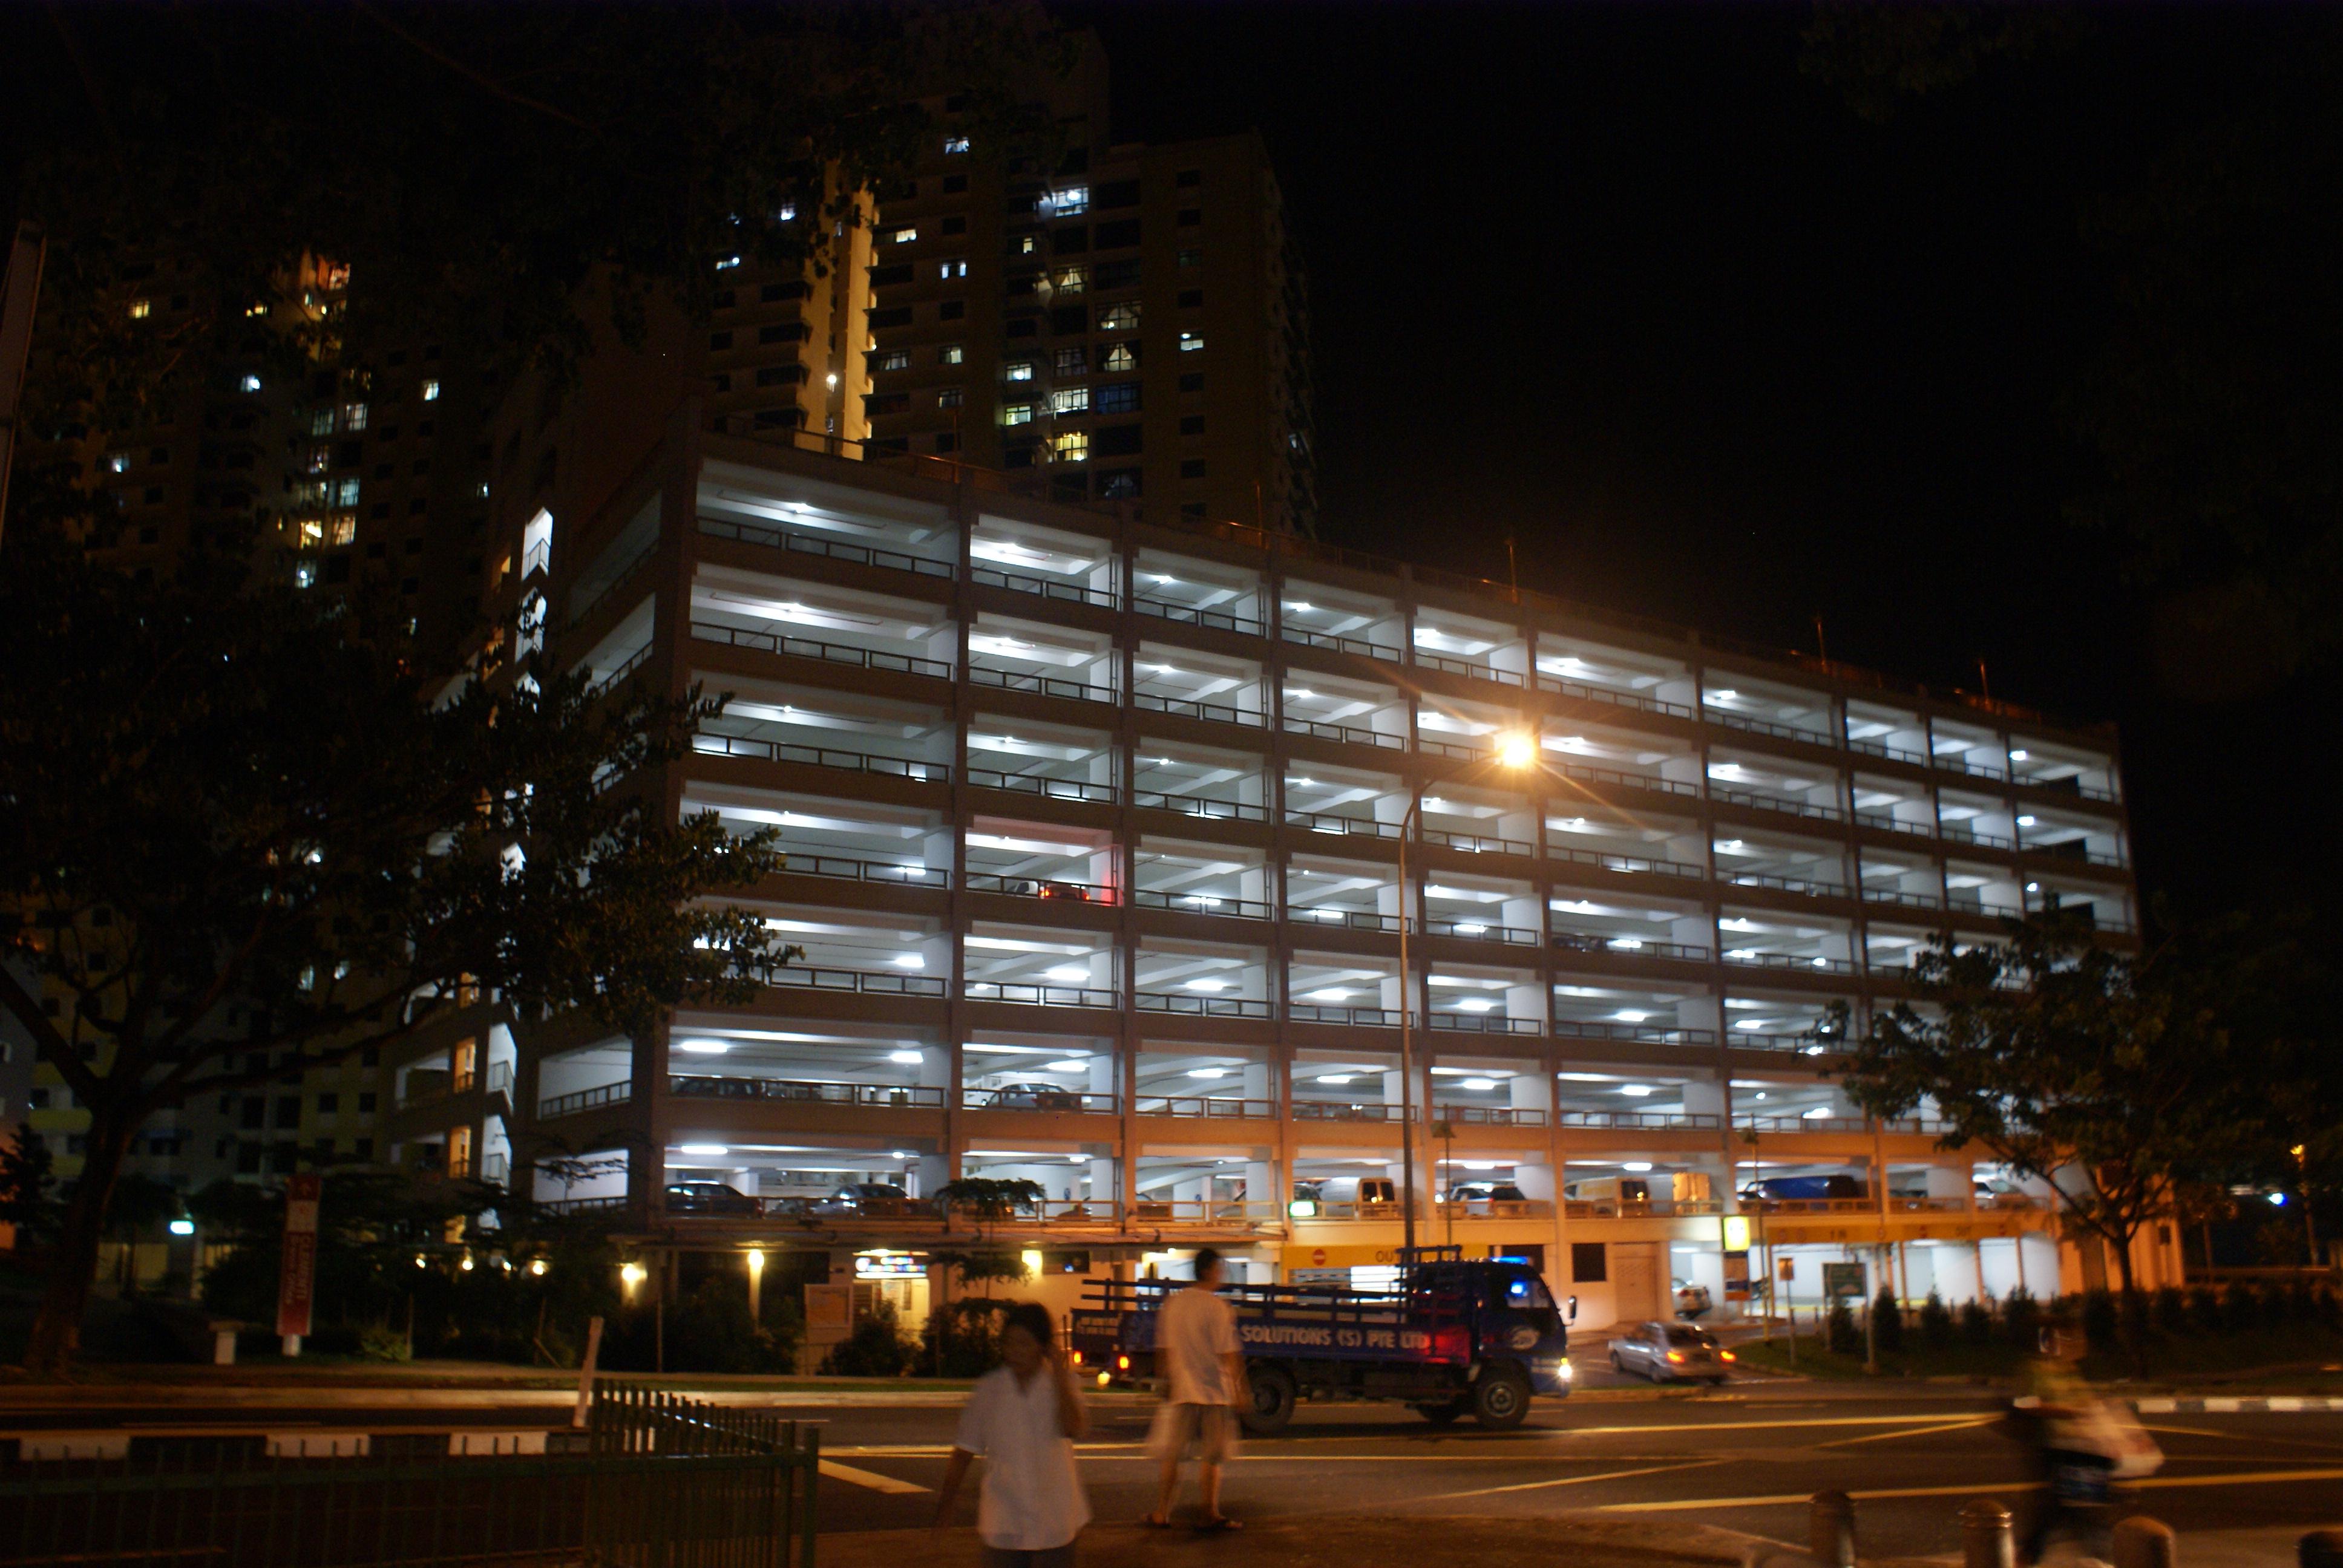 filemultistorey car park in clementi singapore at